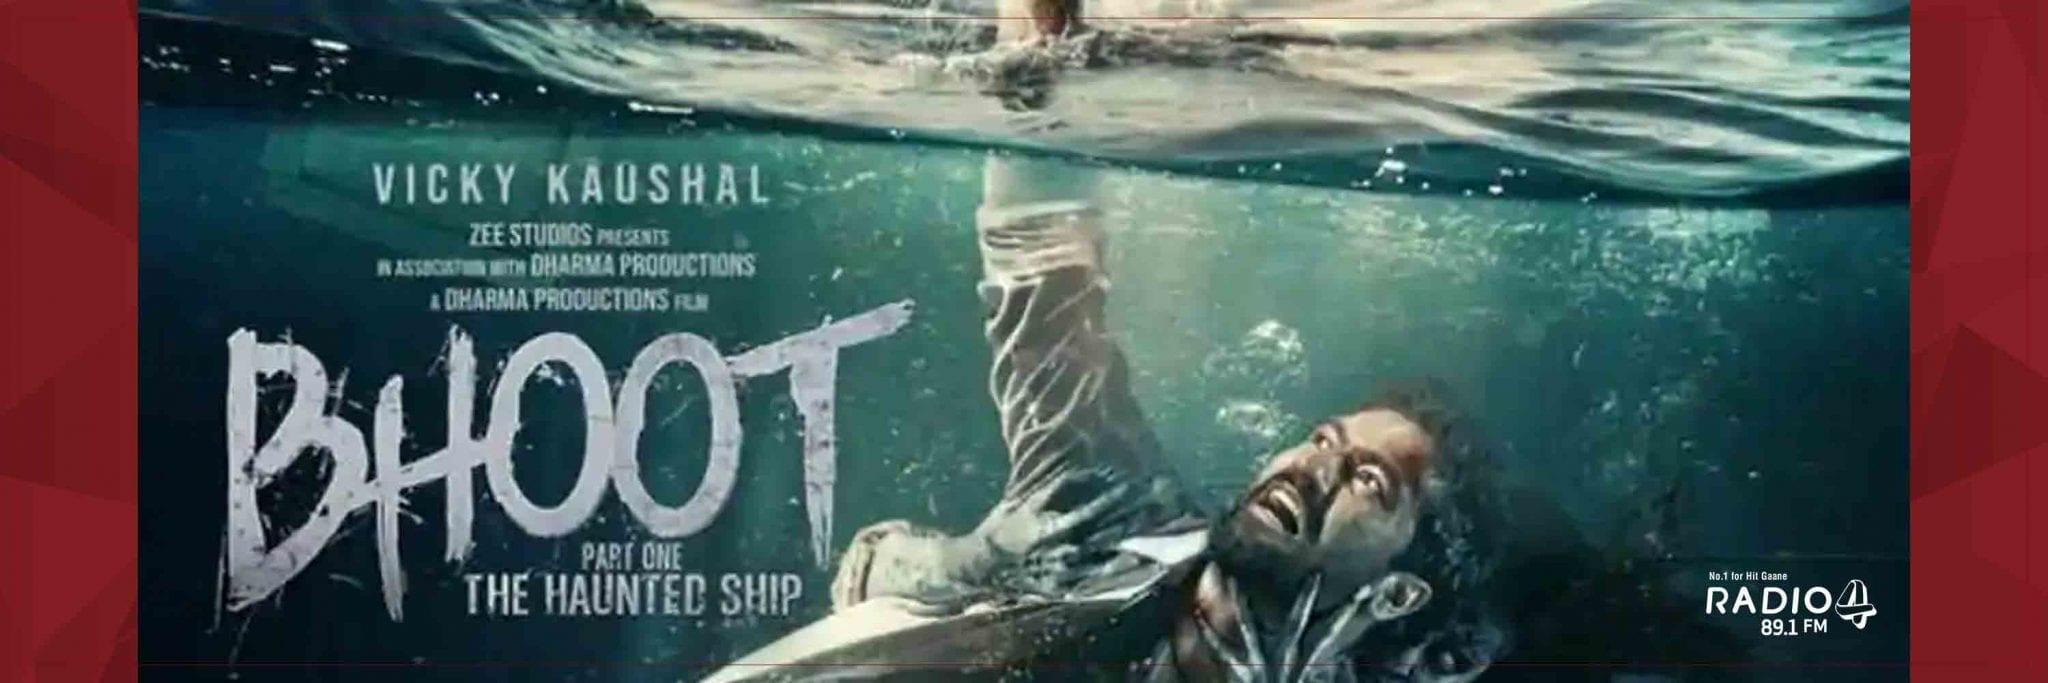 Bhoot-Movie